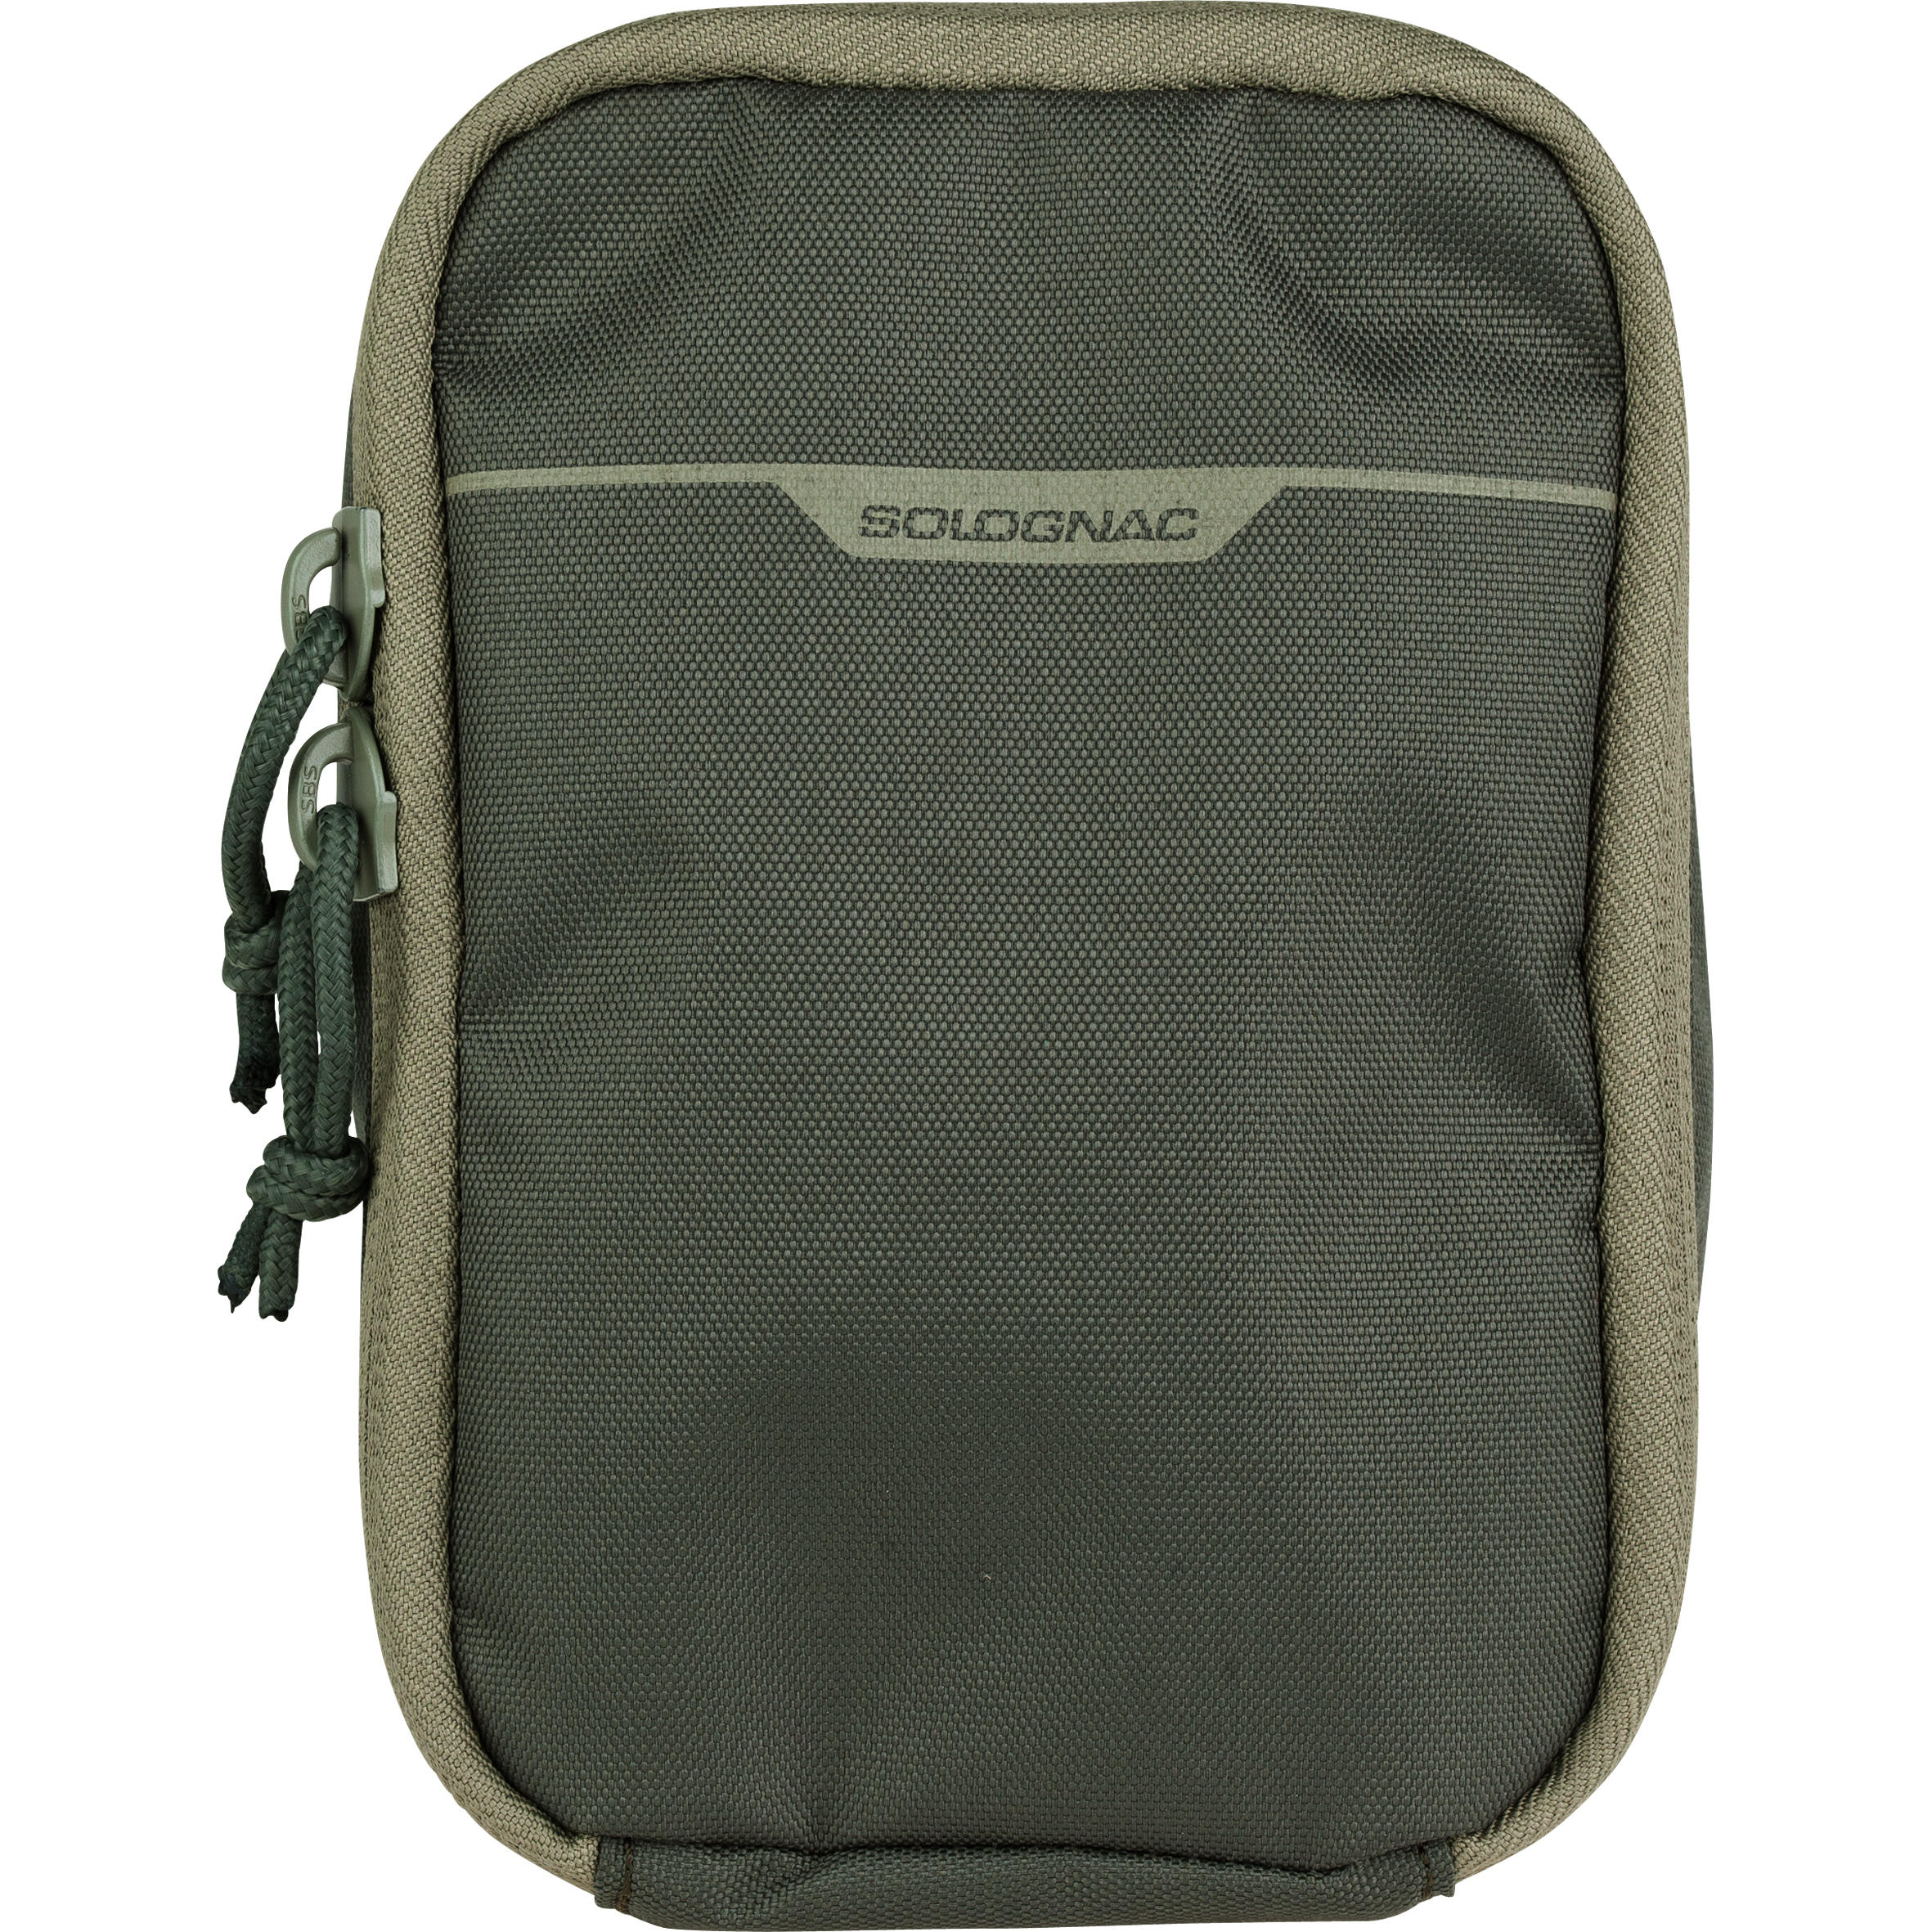 X-Access Organiser Pouch M 12x18 cm Green